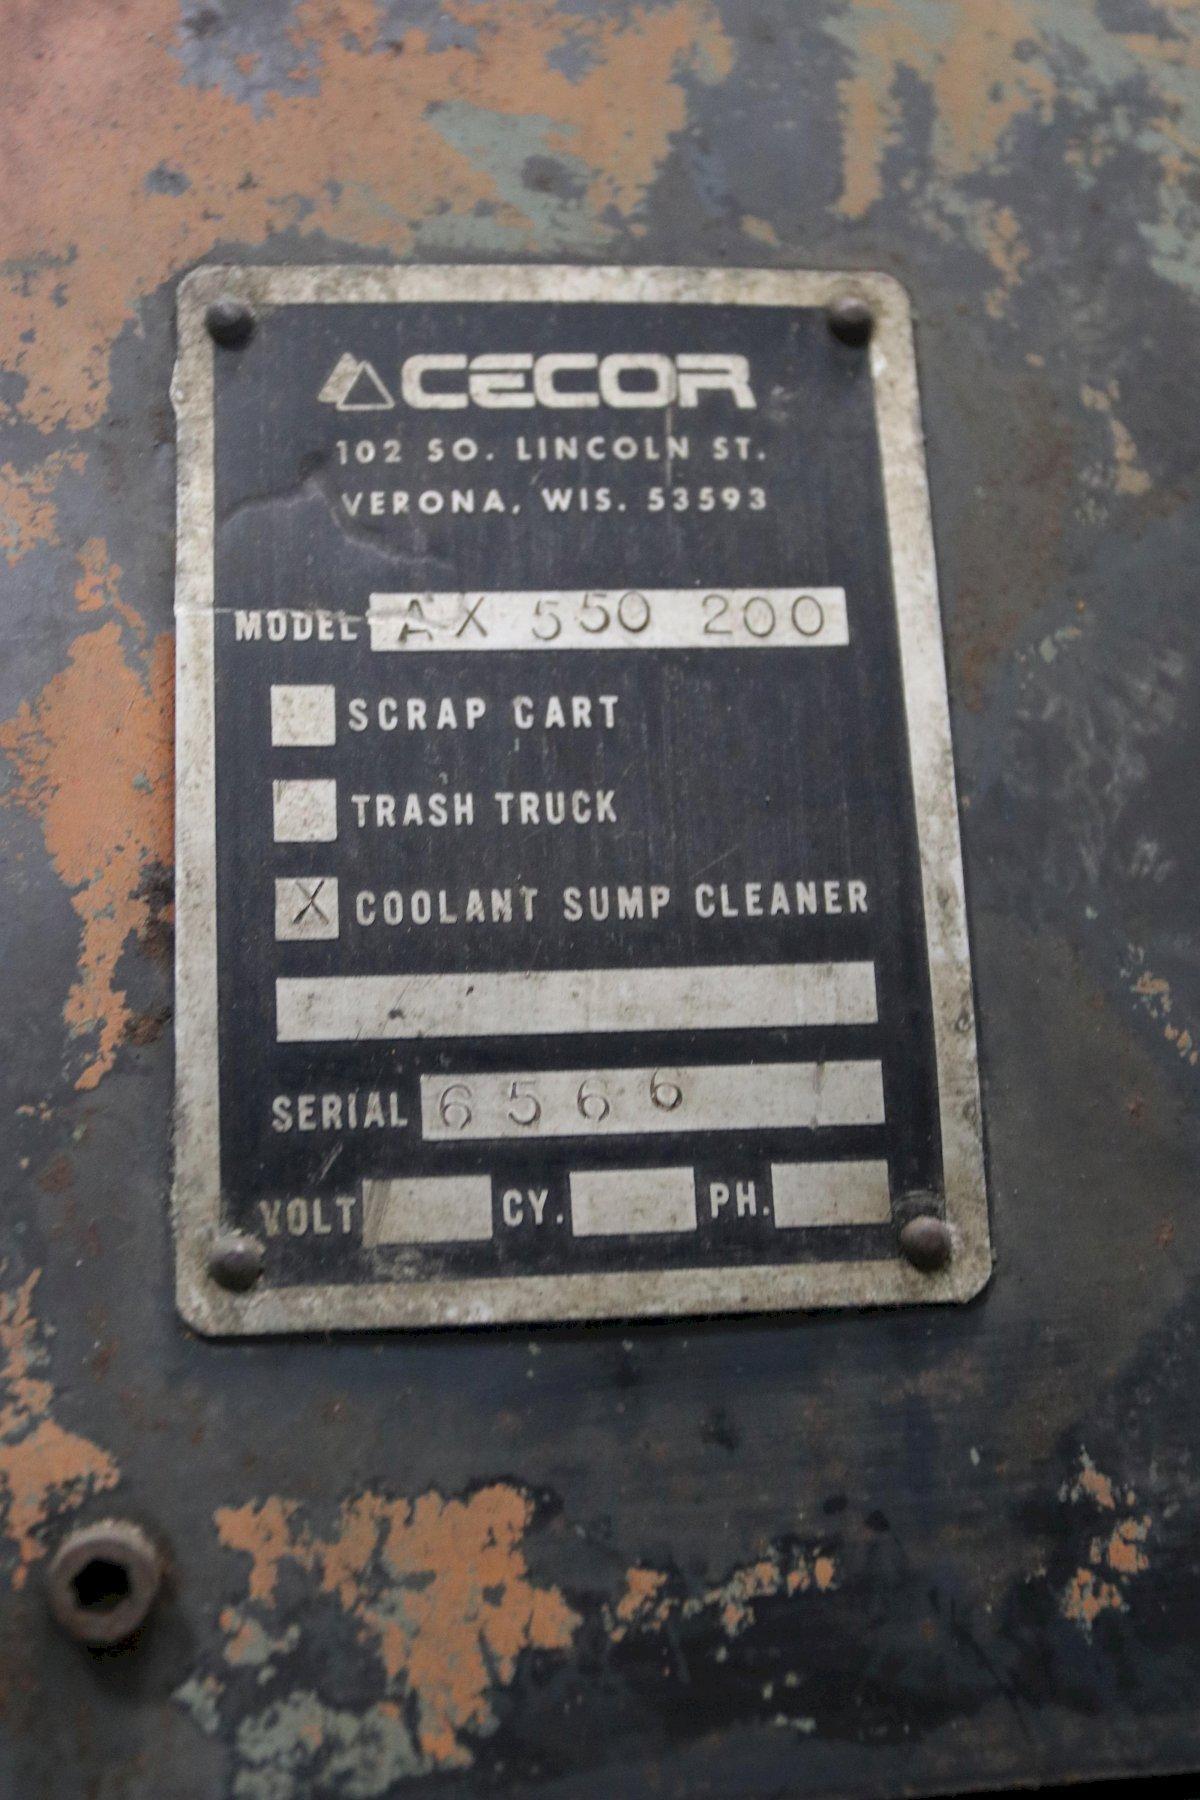 200 GALLON CECOR PORTABLE SUMP CLEANER WITH PNEUMATIC ARO CENTRIFUGAL PUMP: STOCK 11854